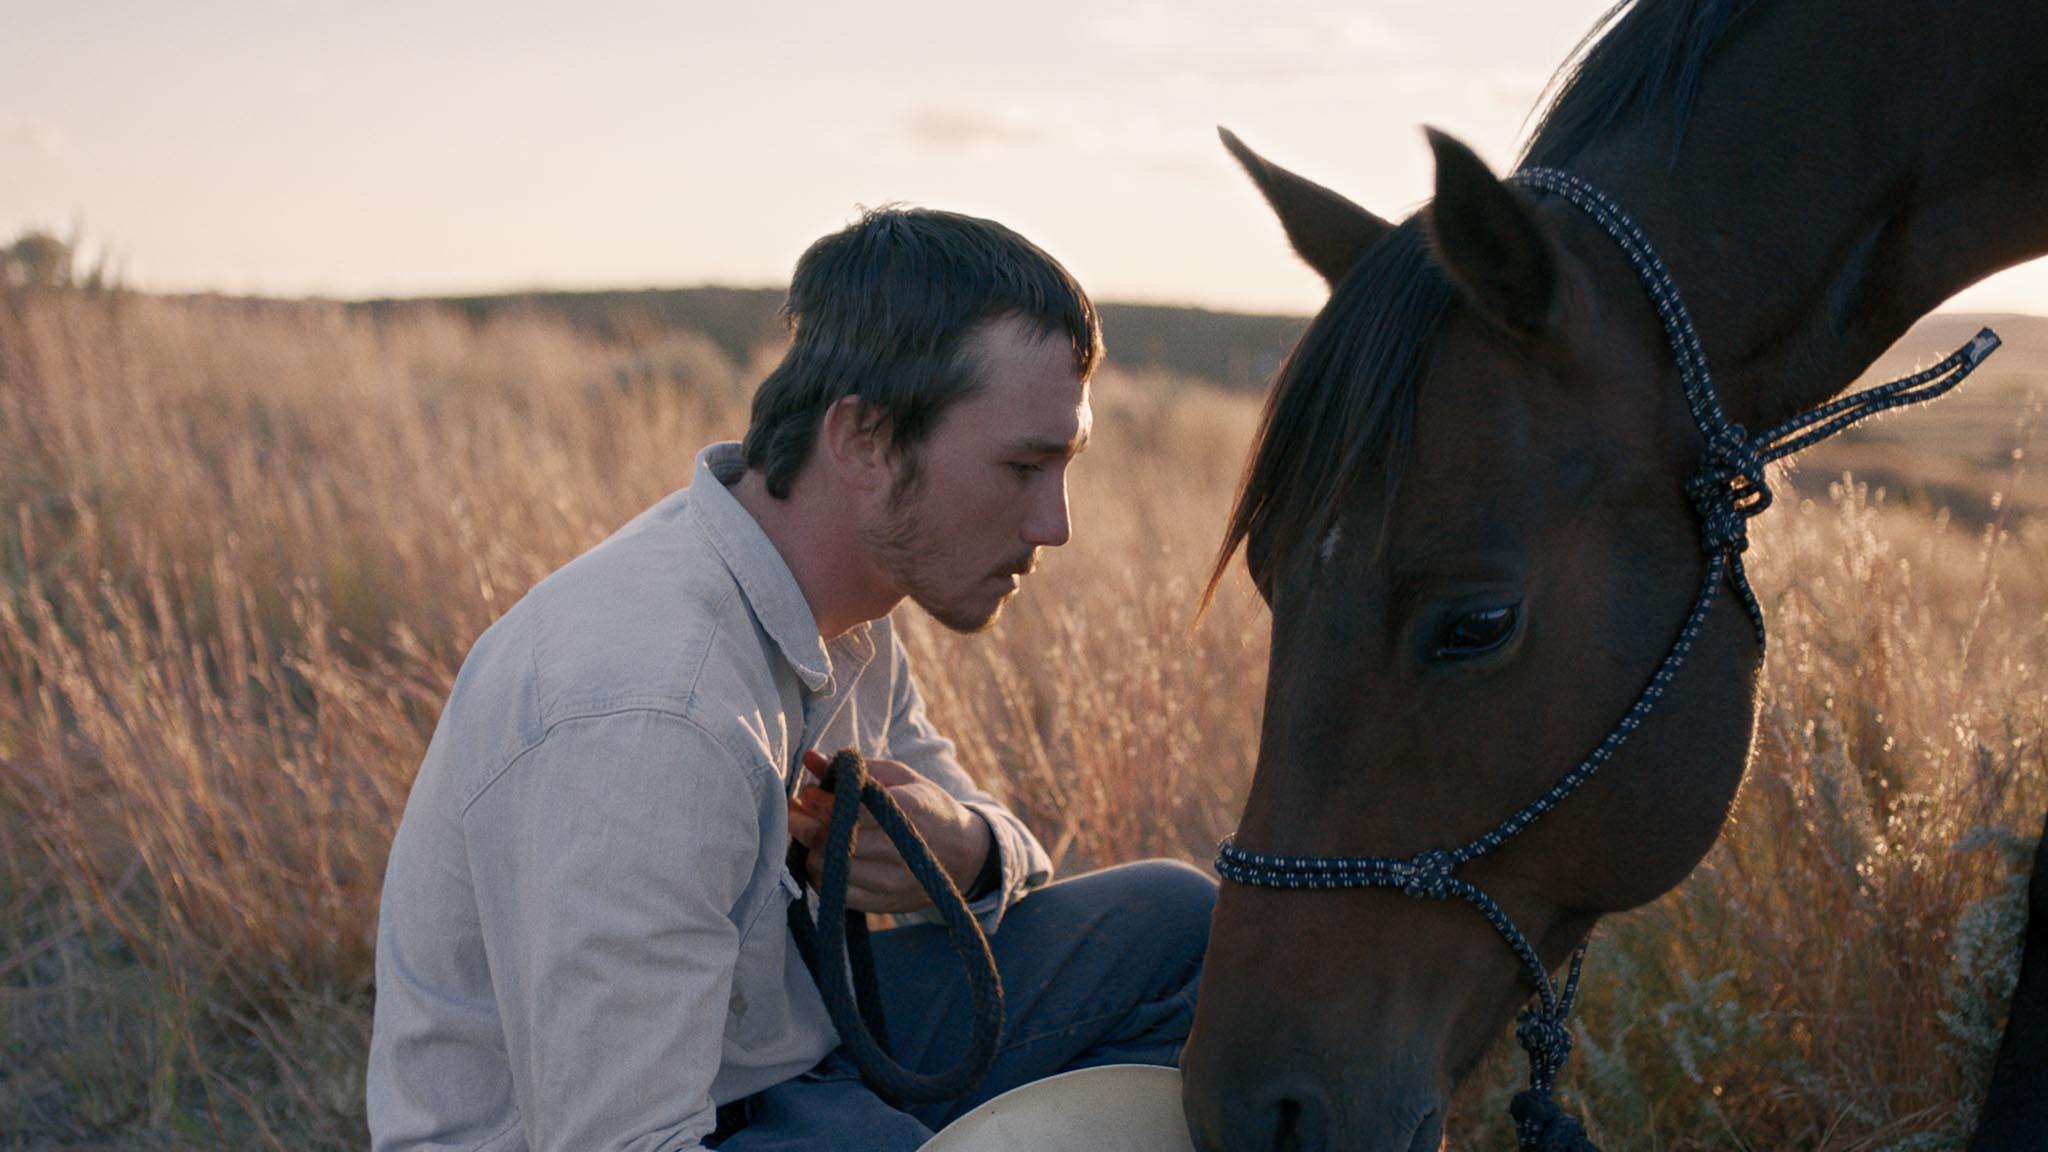 (Image courtesy of Sony Pictures Classics via EPK.tv)